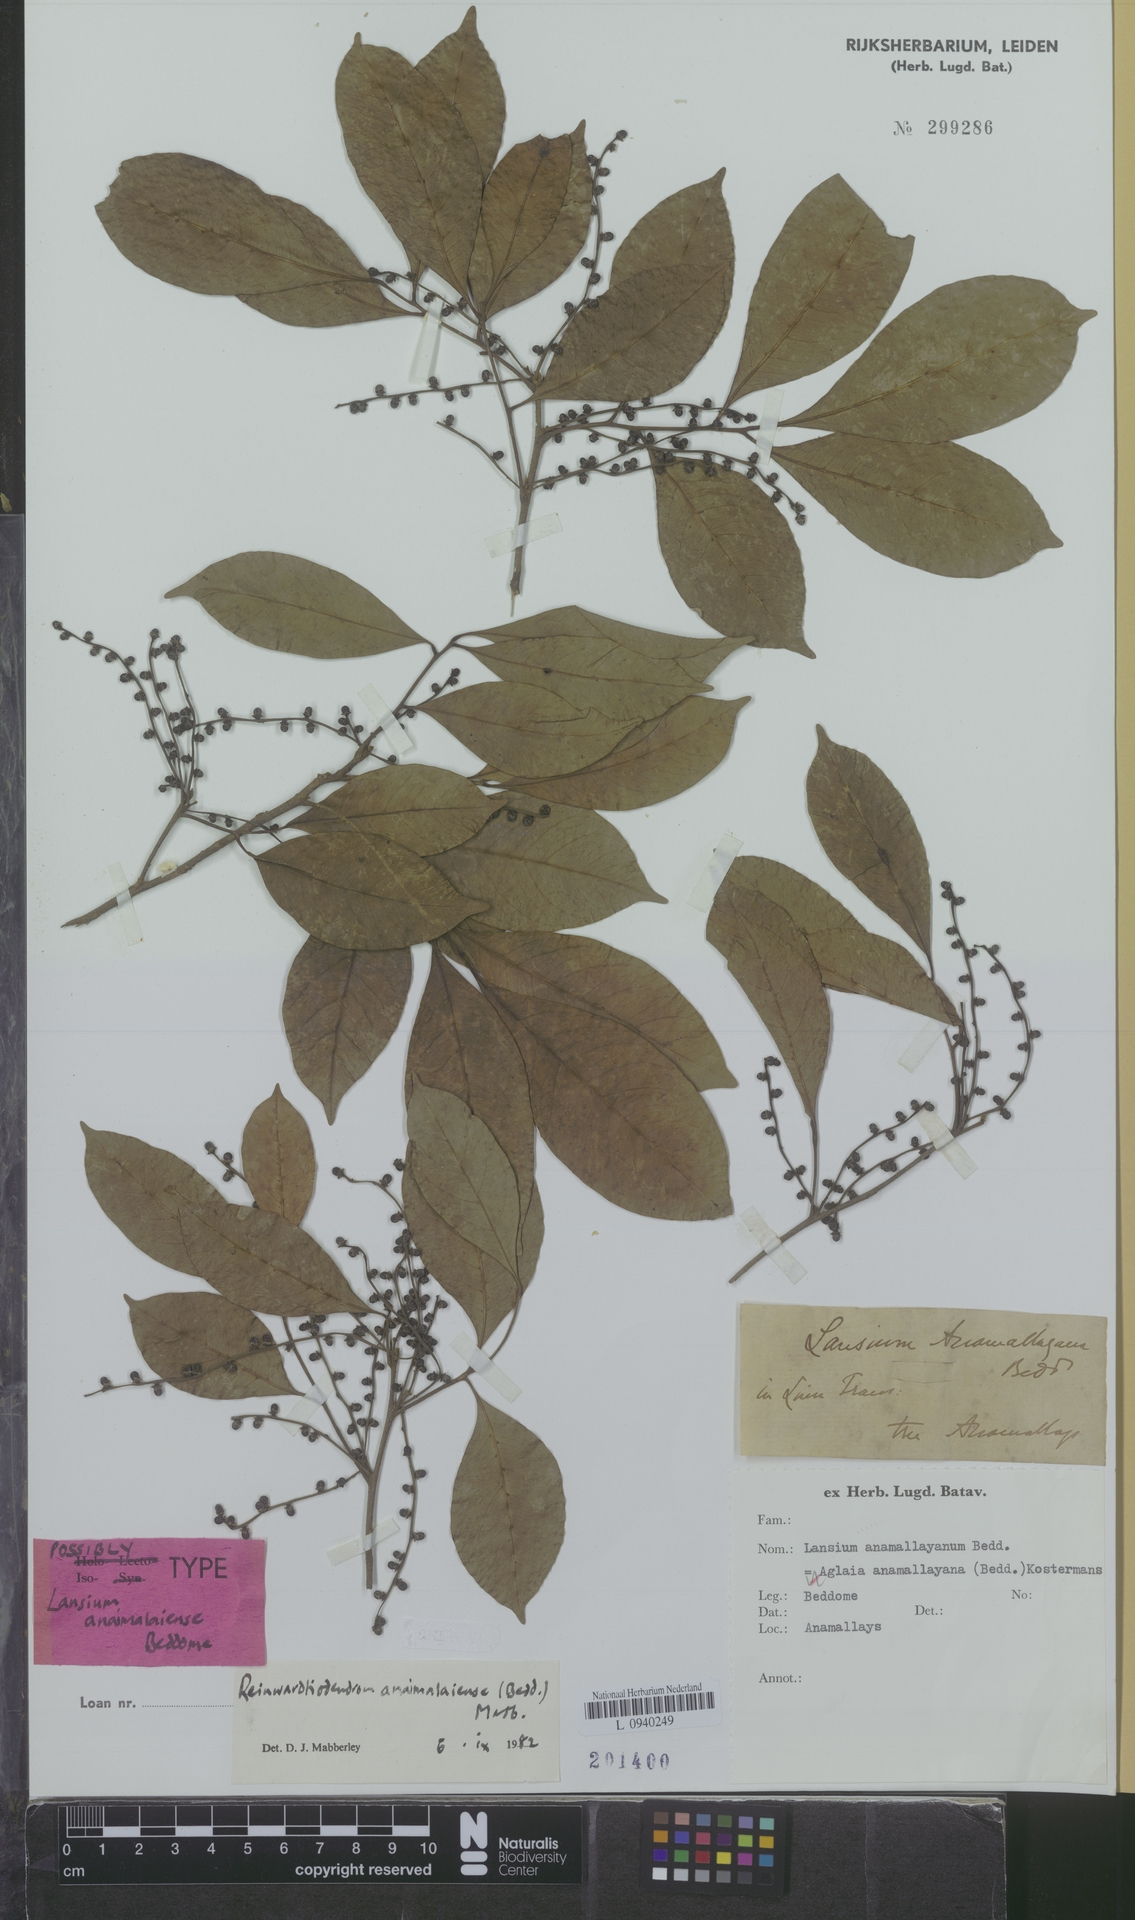 L  0940249   Reinwardtiodendron anamalaiense (Bedd.) Mabb.